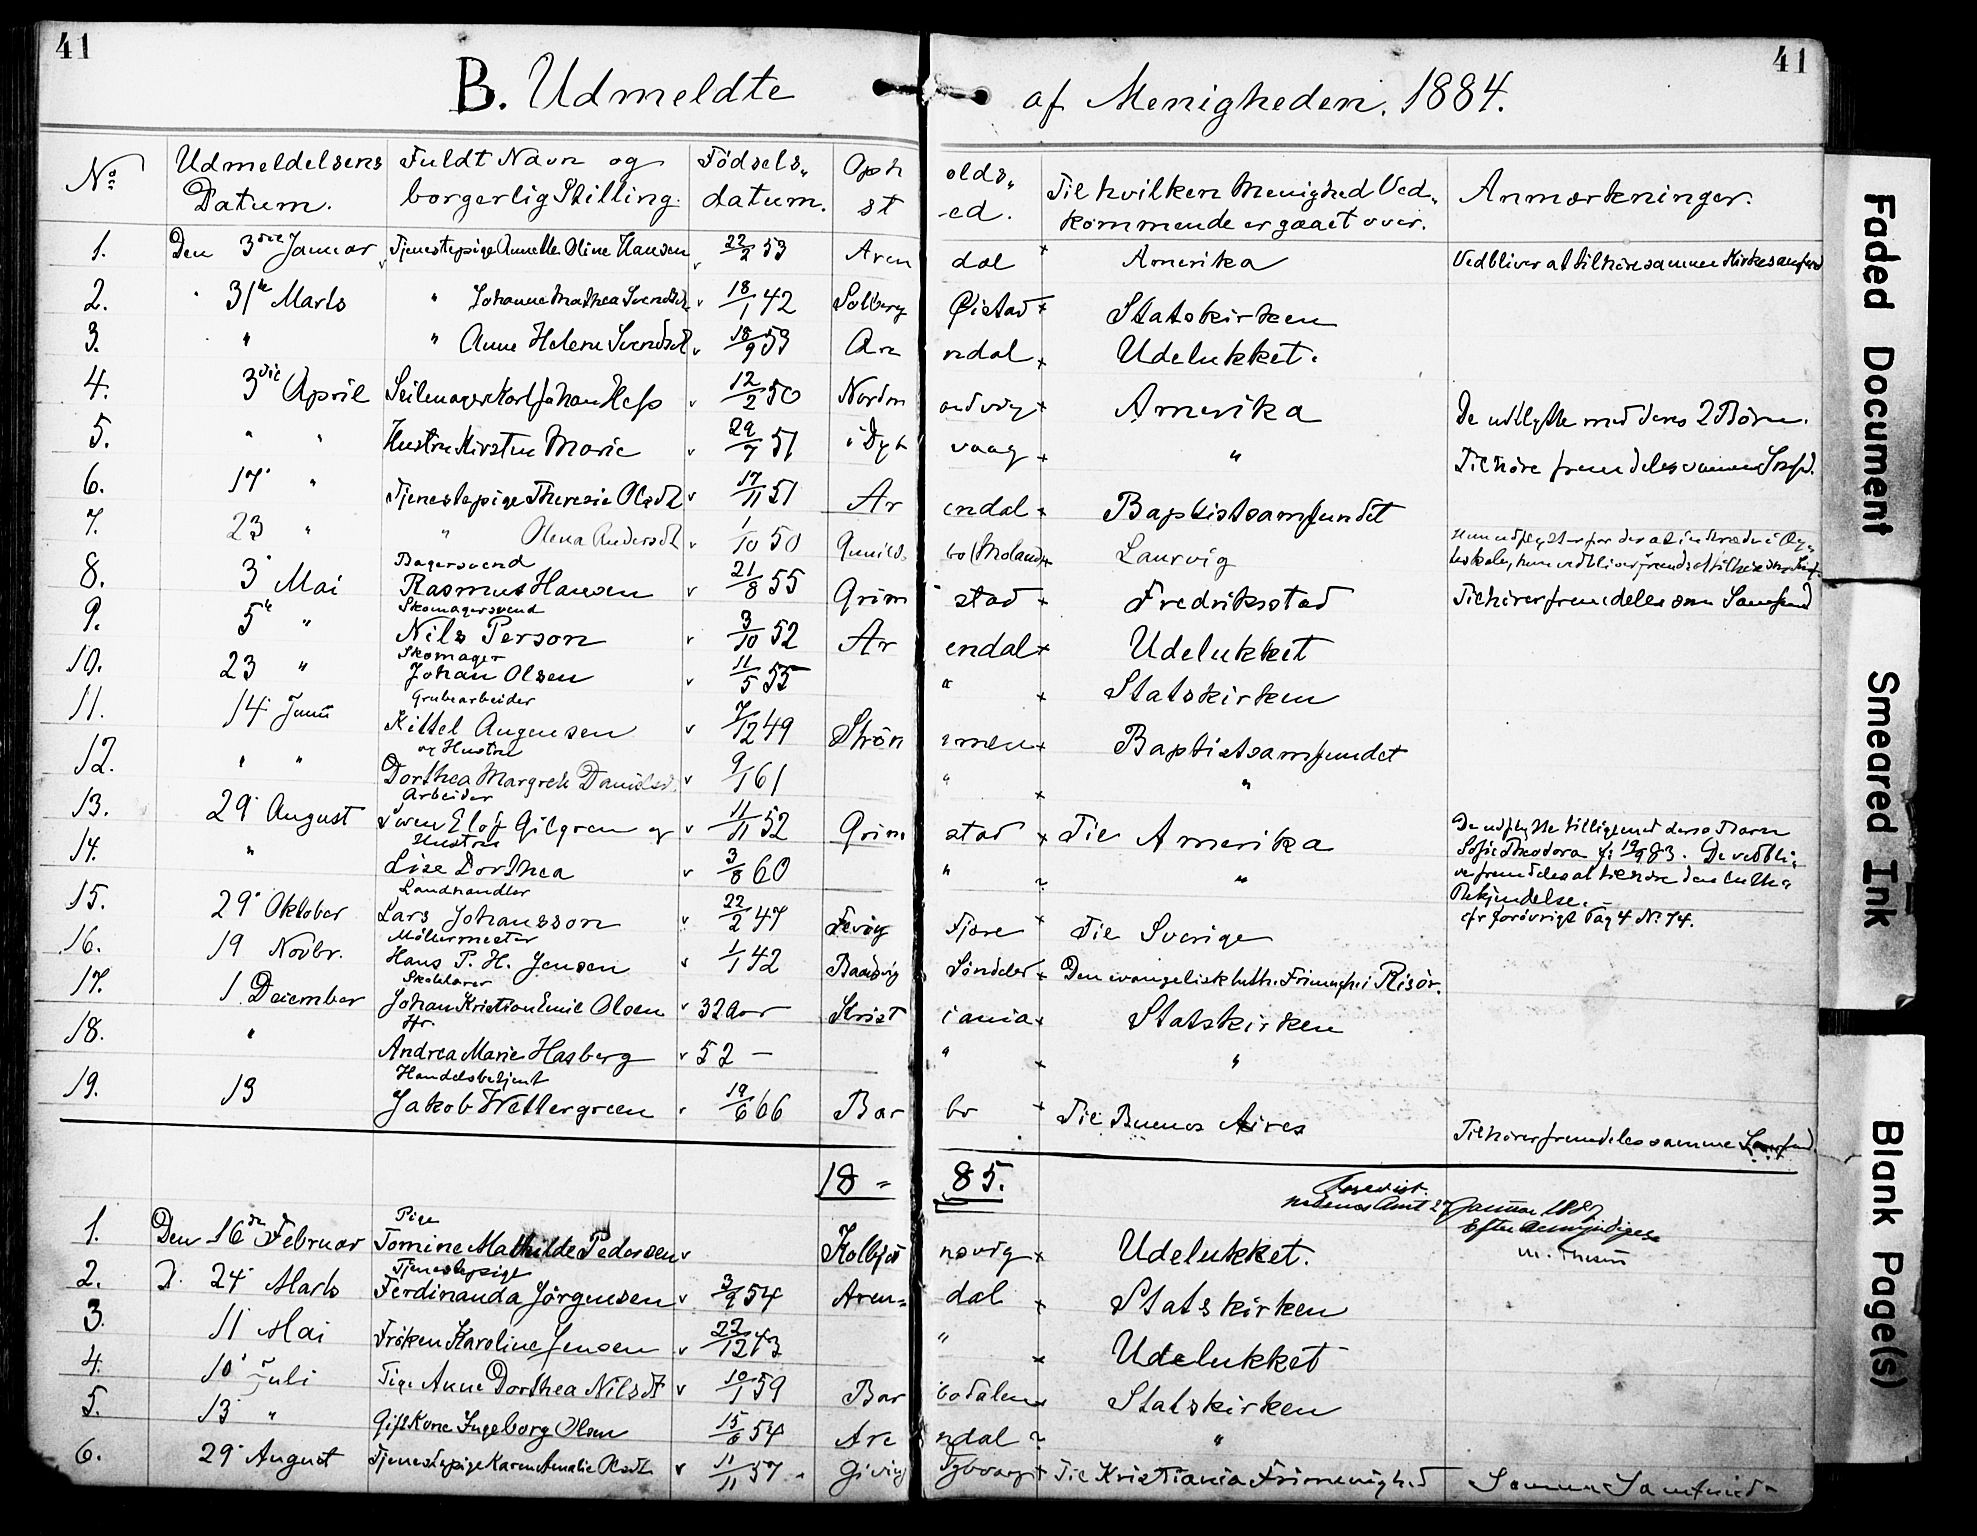 SAK, Den evangelisk-lutherske frimenighet, Arendal, F/Fa/L0002: Dissenterprotokoll nr. F 6, 1884-1908, s. 41